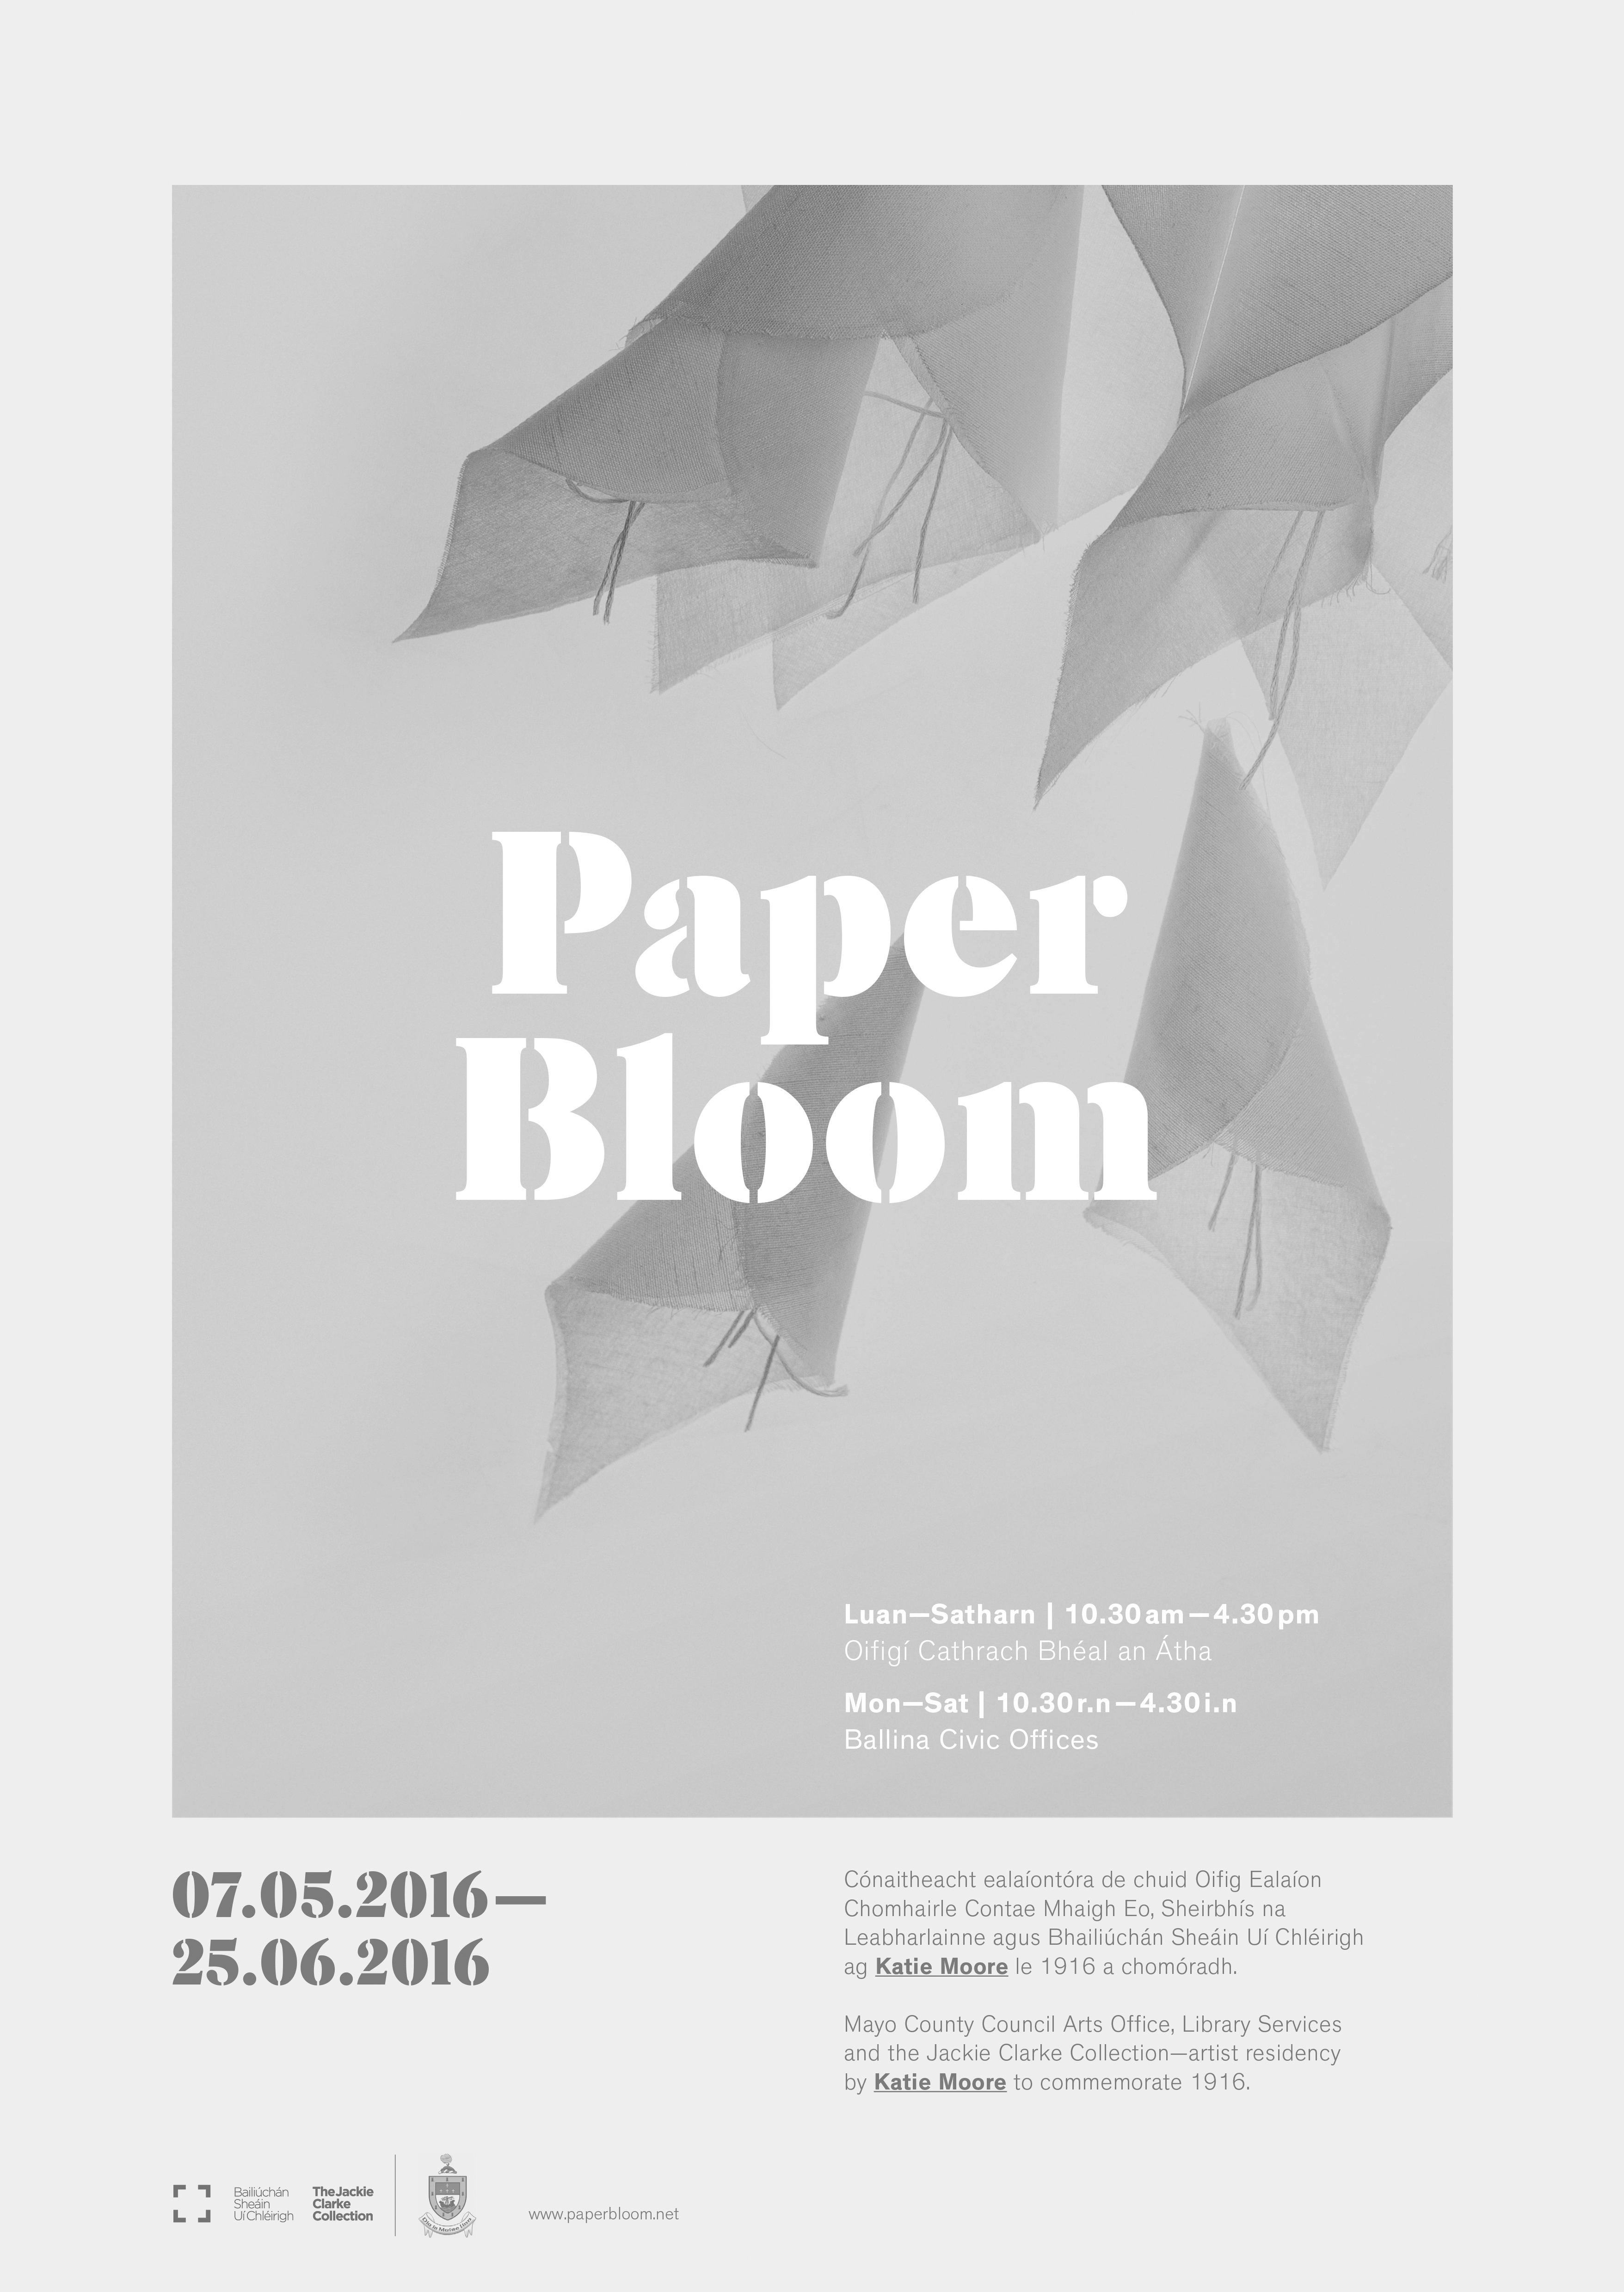 bloom essays